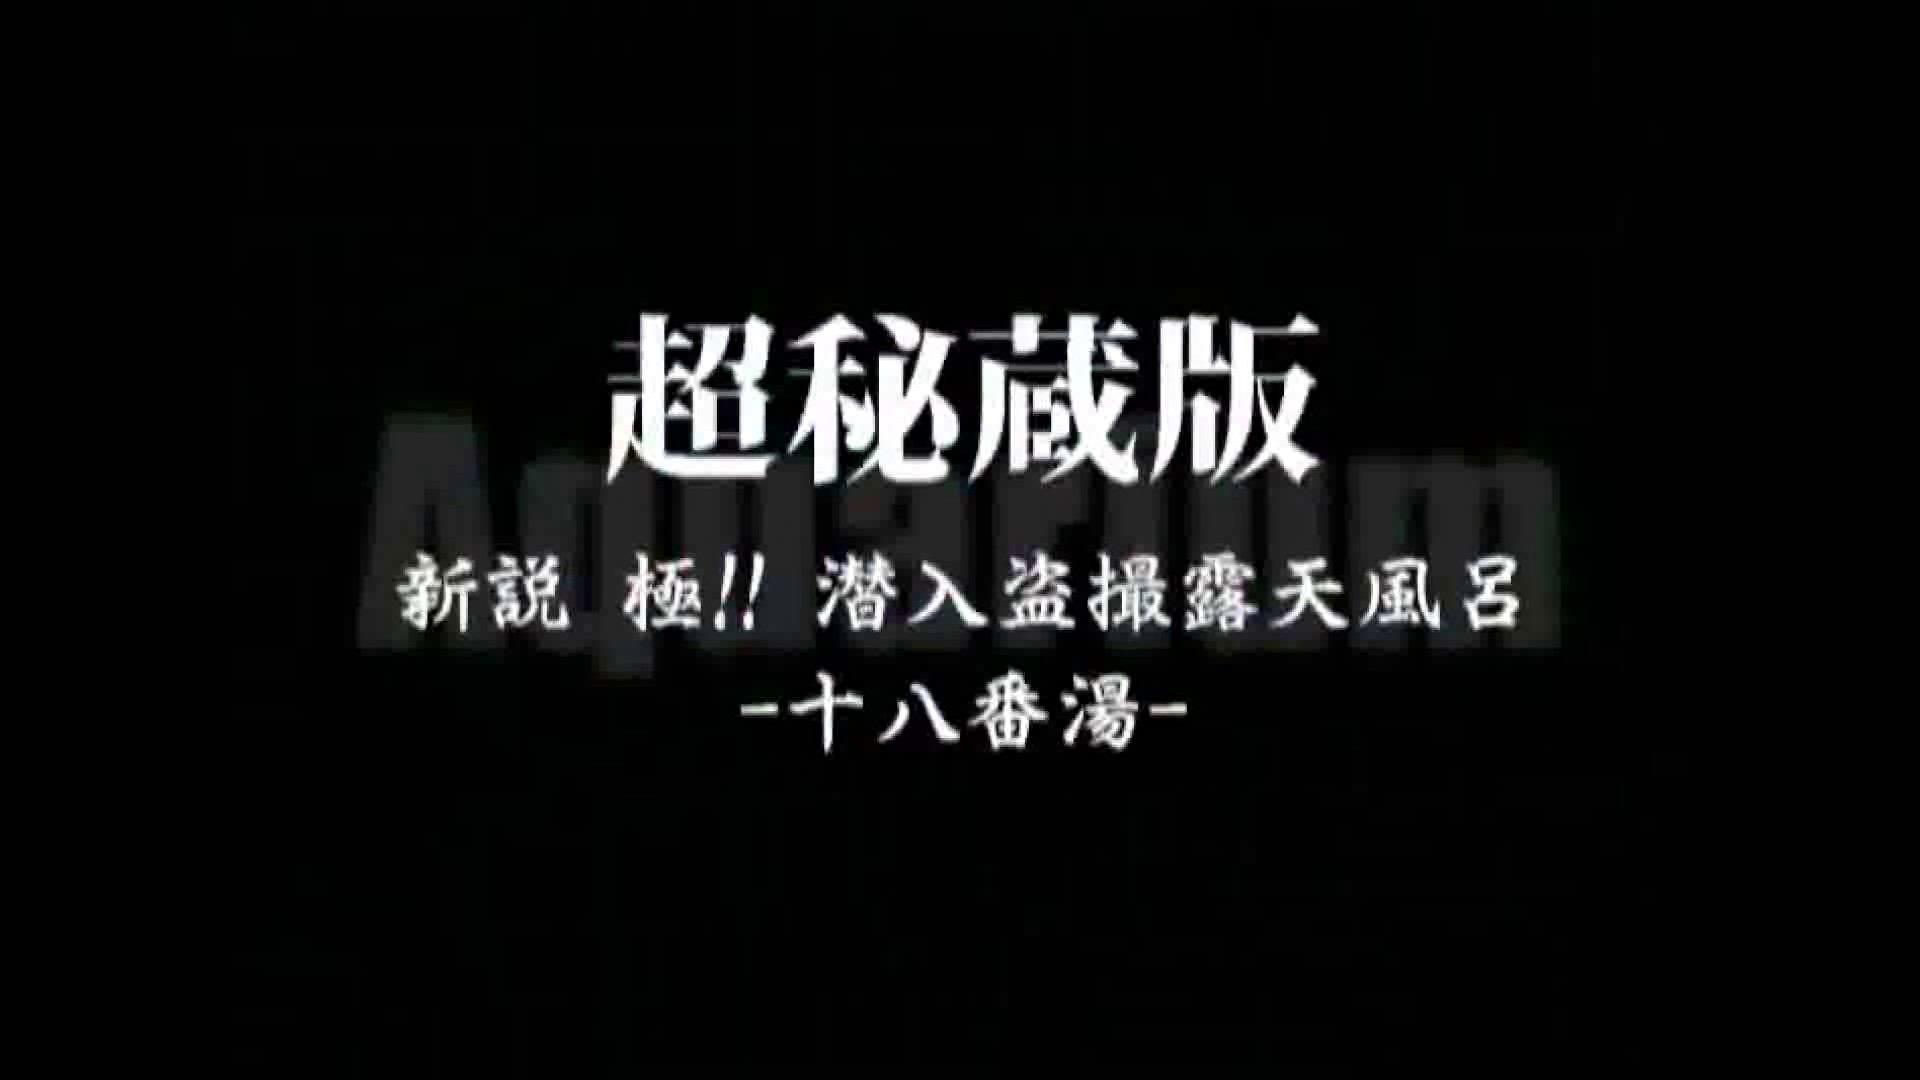 Aquaな露天風呂Vol.882潜入盗撮露天風呂十八判湯 其の一 露天 | 潜入シリーズ  51pic 1